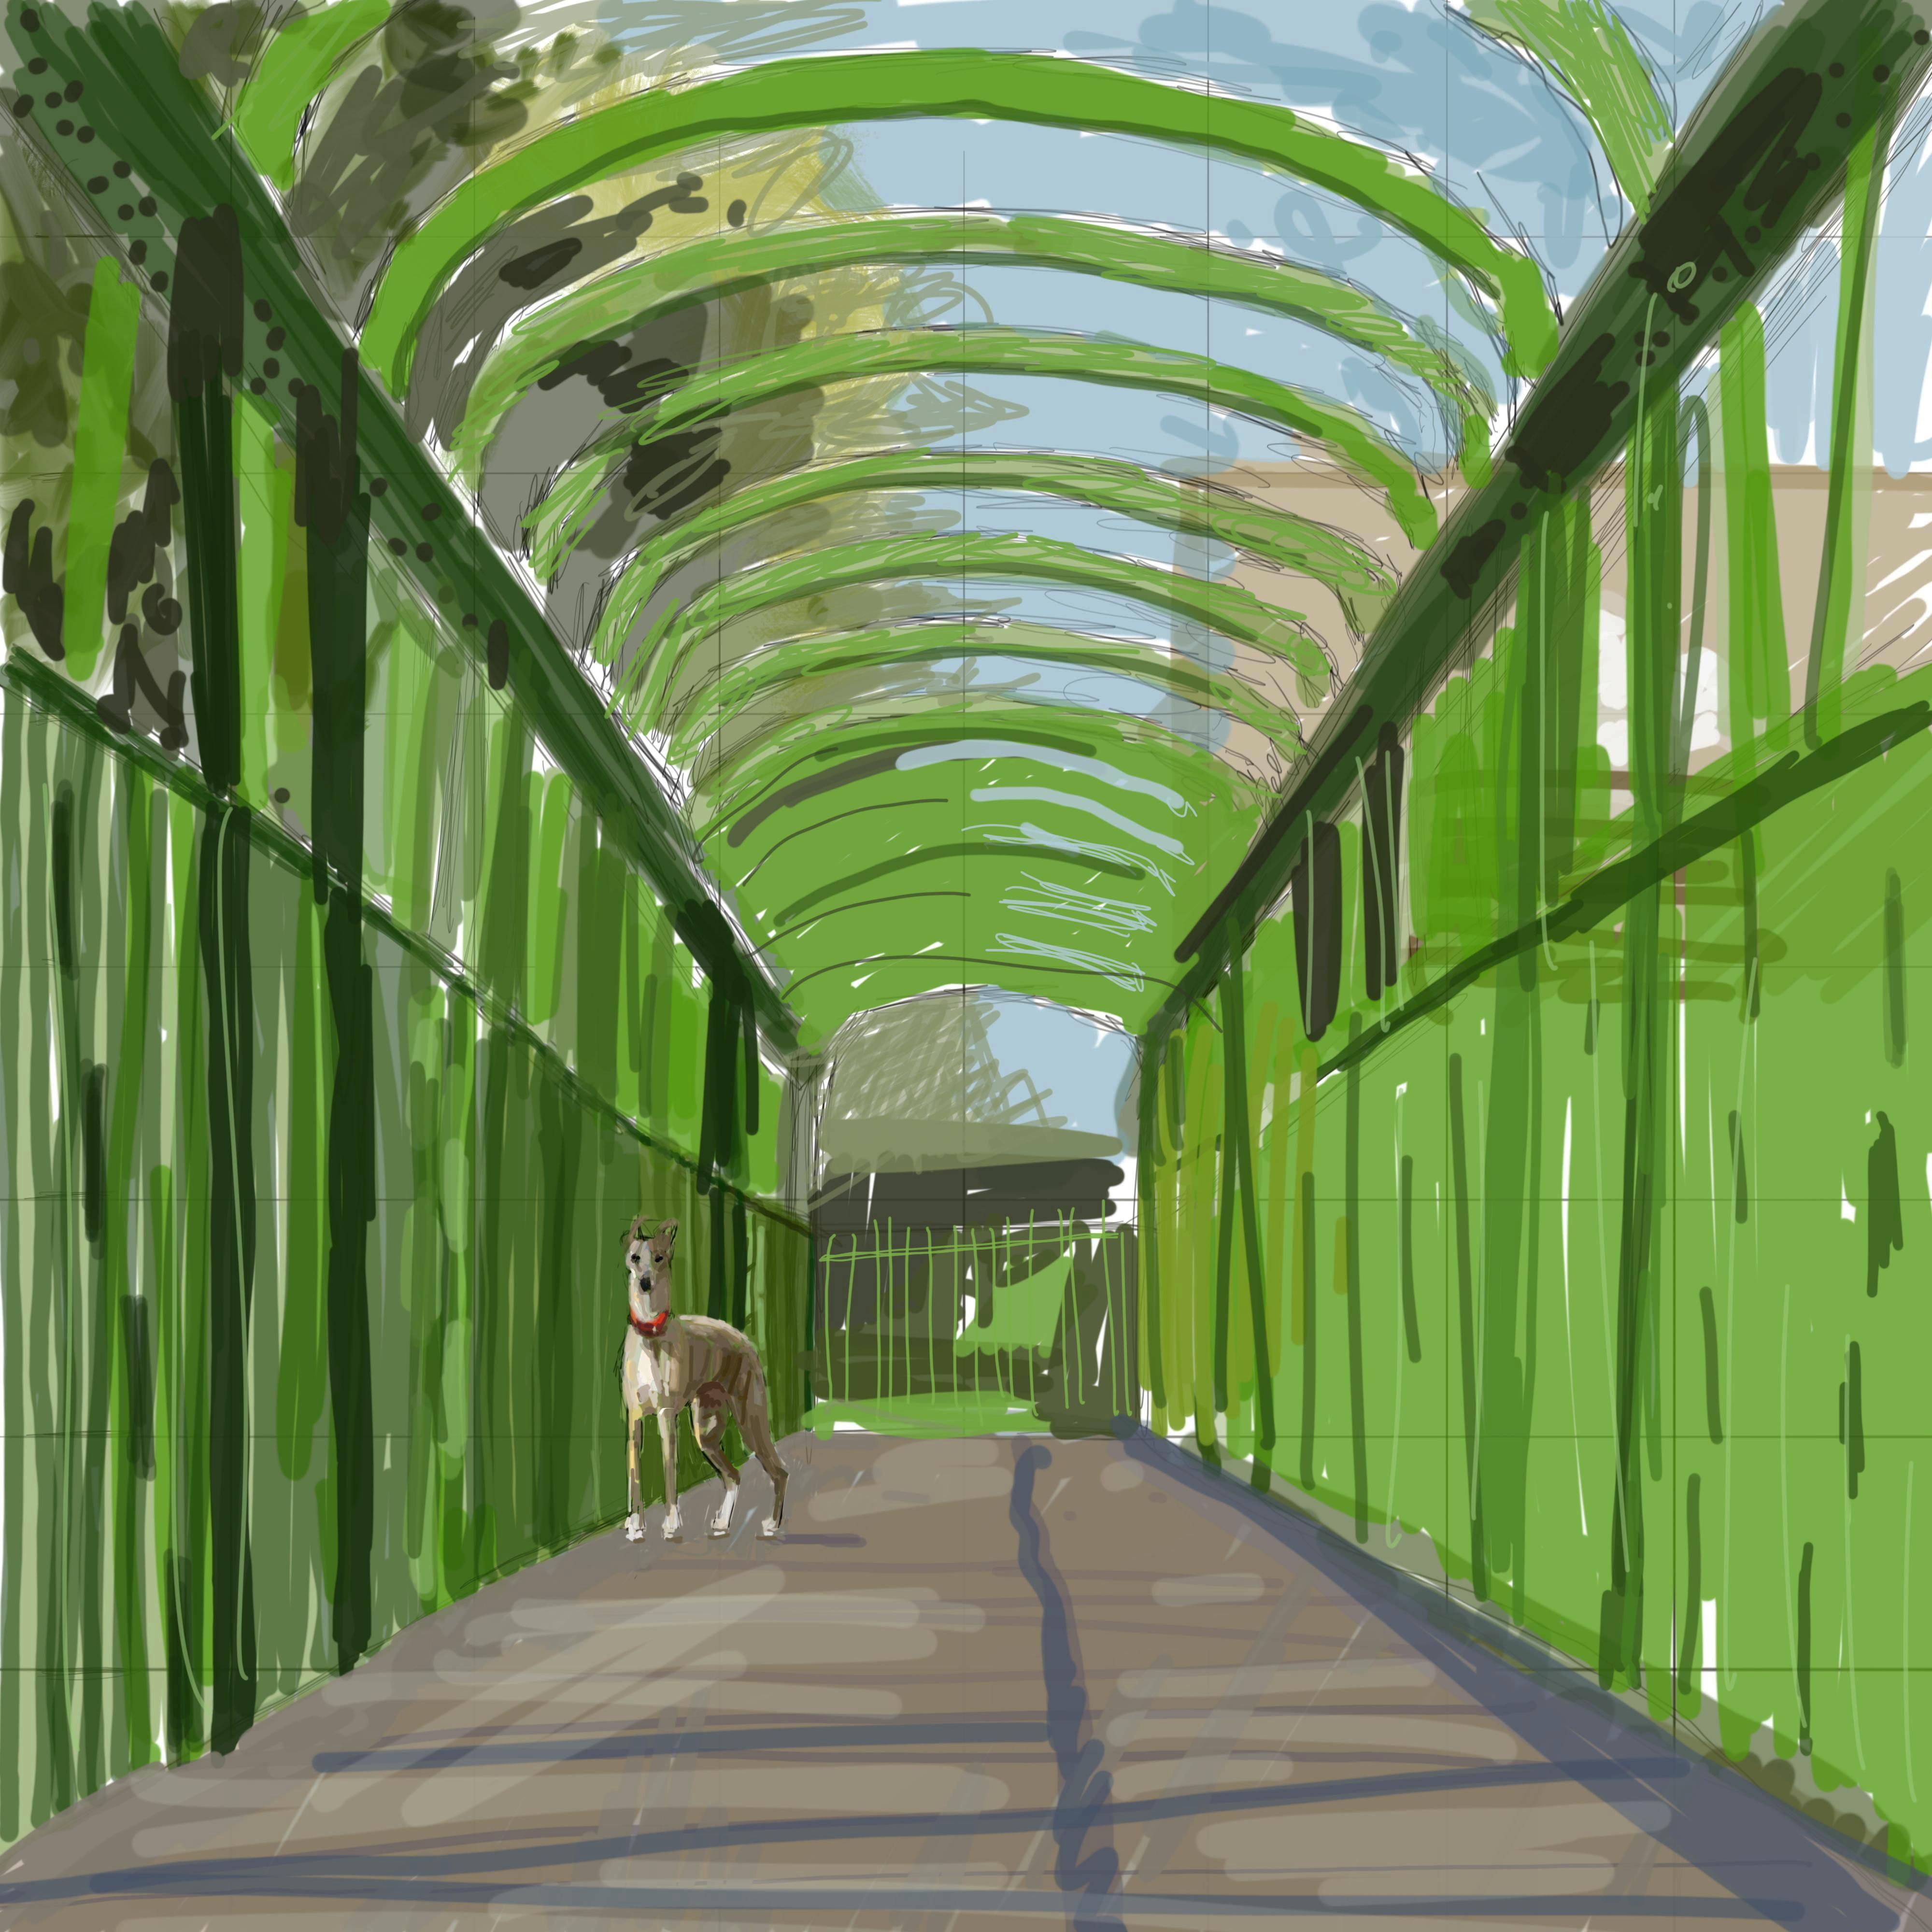 Effie on the green bridge3